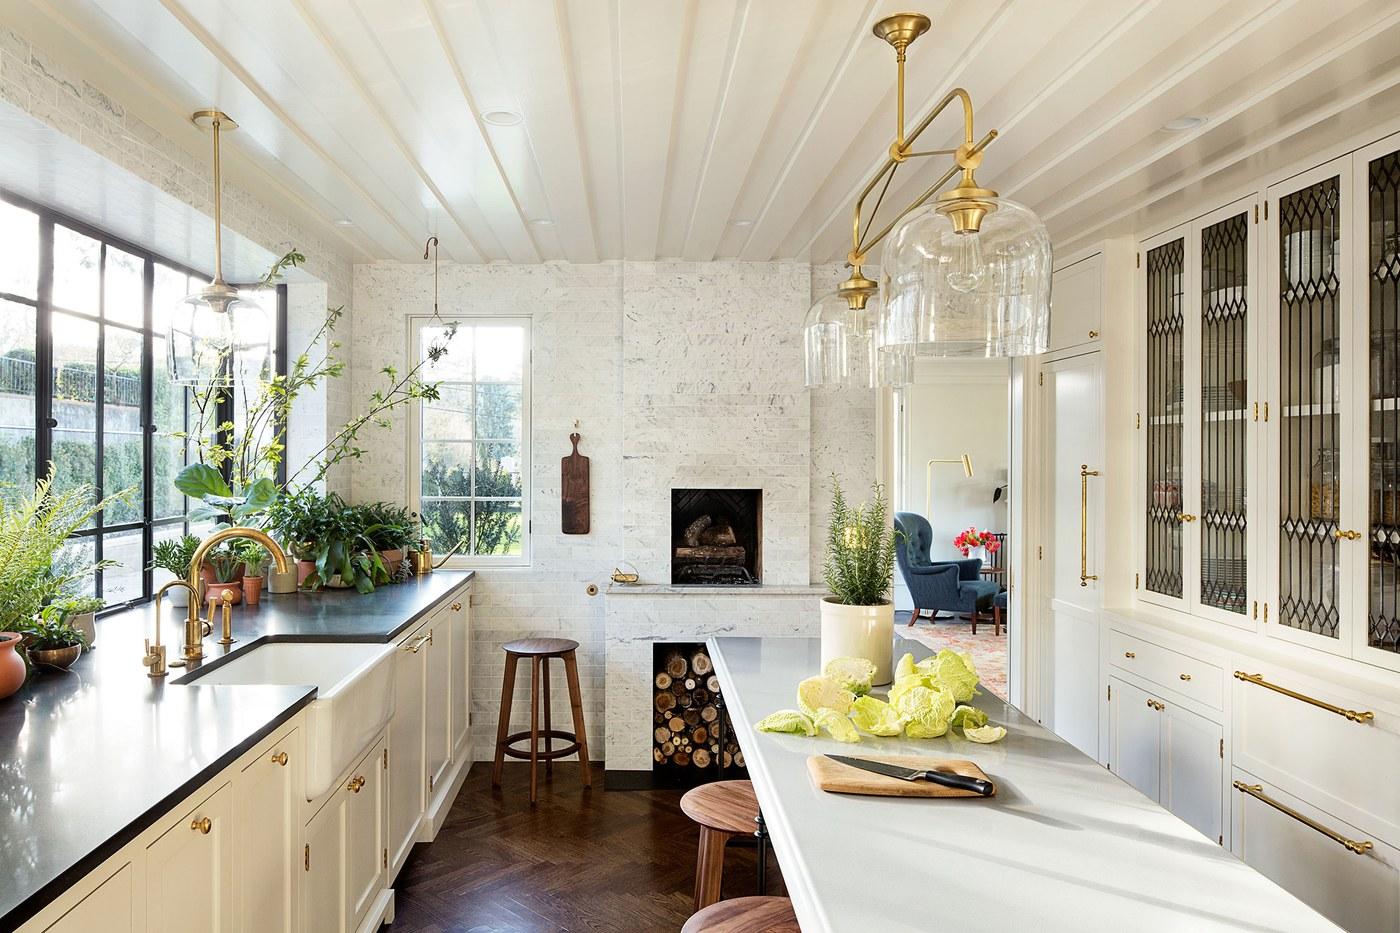 Oregon Home Design by Jessica Helgerson. Kitchen.